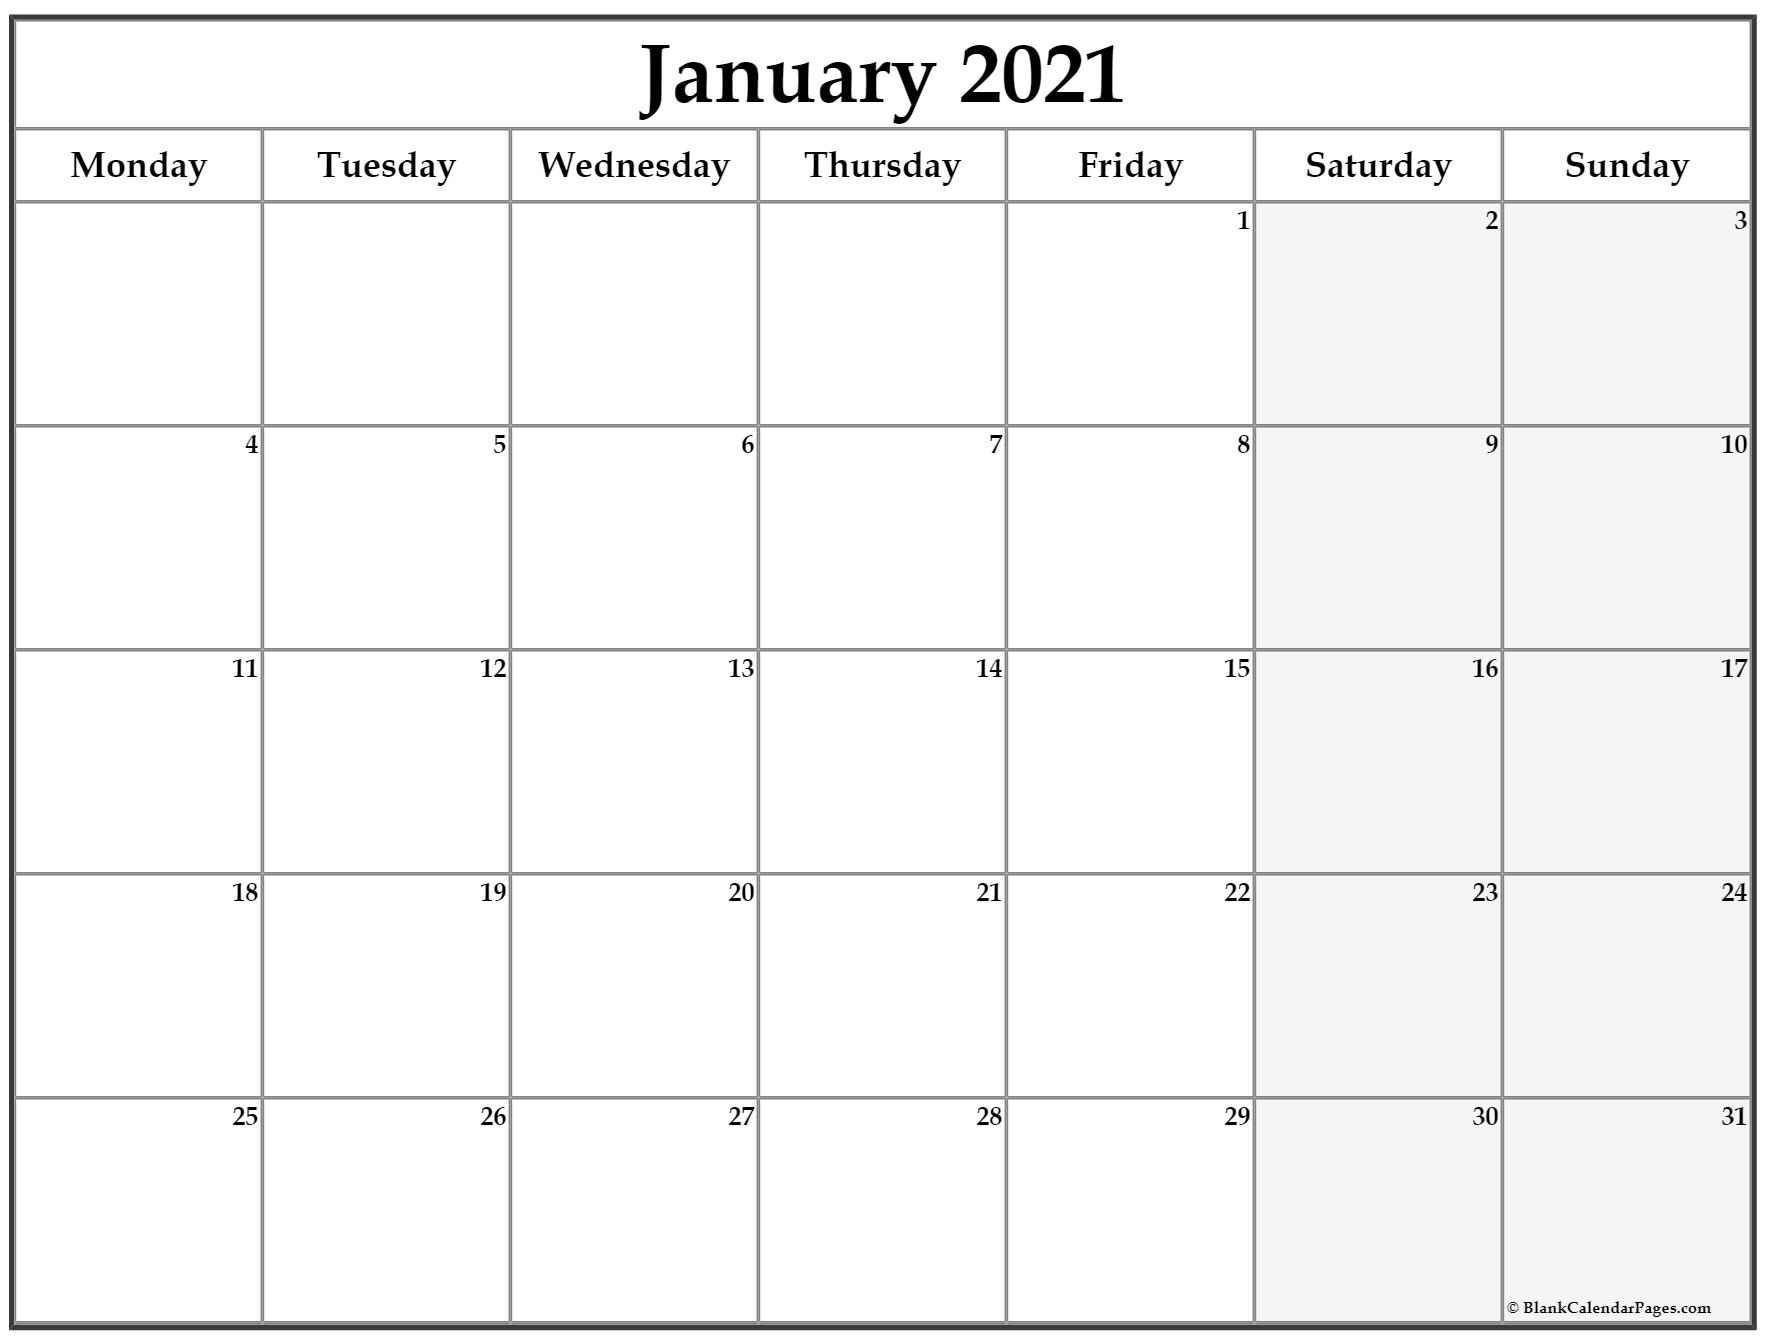 Printable Monthly Calendar 2021 Starting Monday | Free 2021 Printable Calendars